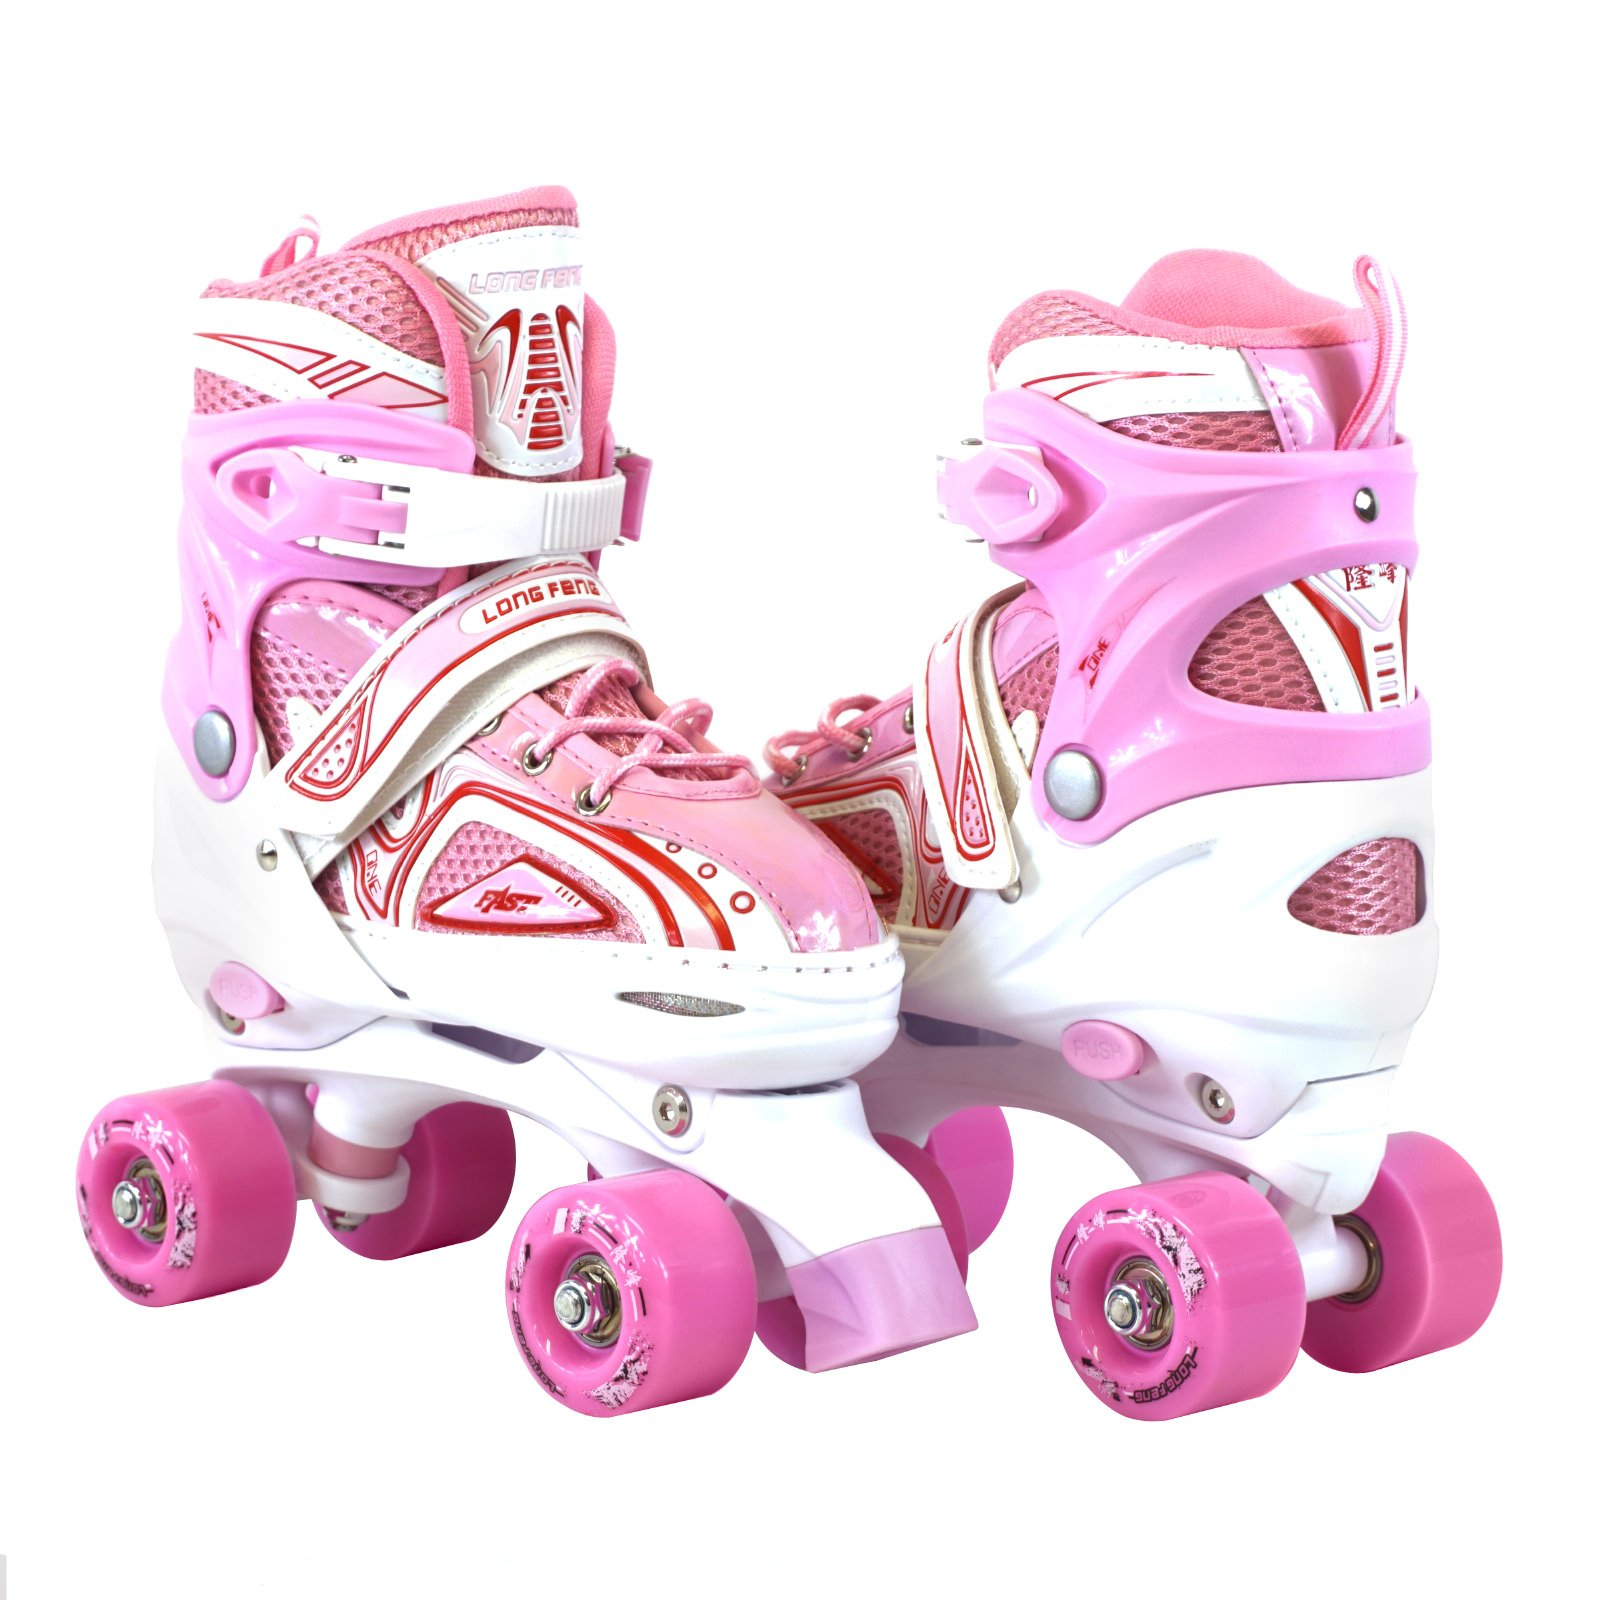 Adjustable Pink Quad Roller Skates For Kids Comfortable Indoor Or Outdoor Use Medium Size by Long Feng